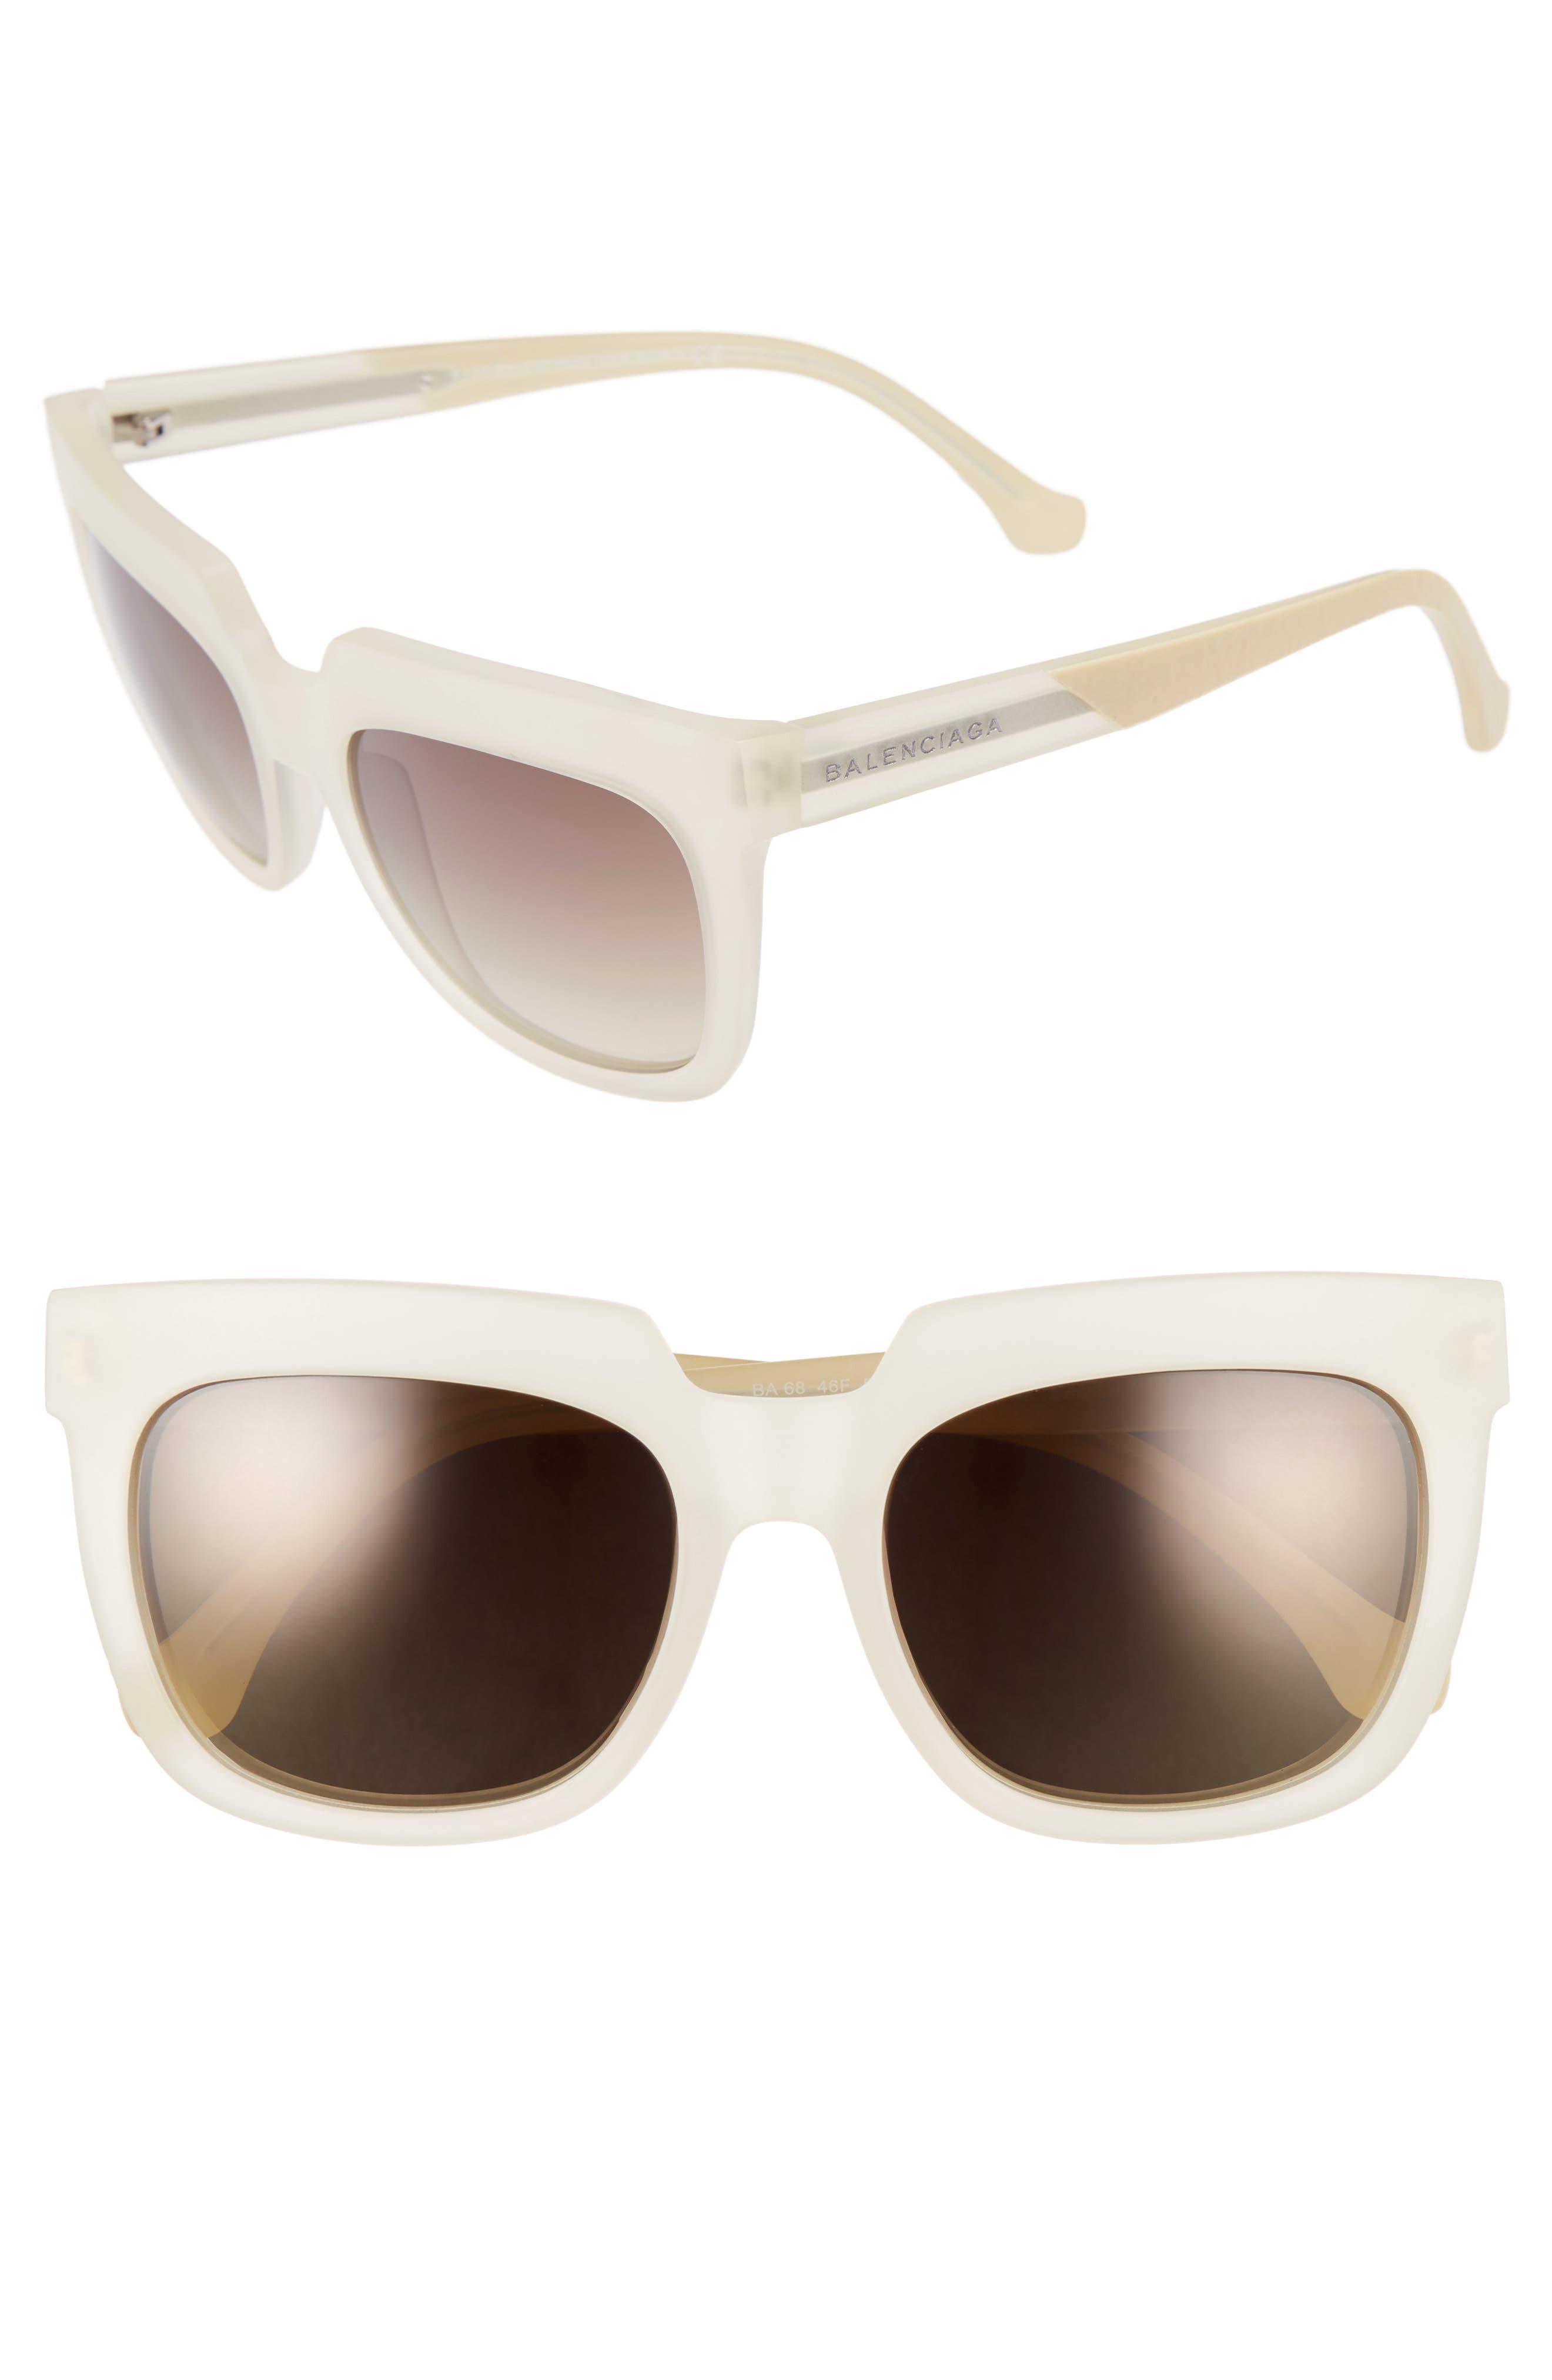 55mm Sunglasses,                             Main thumbnail 4, color,